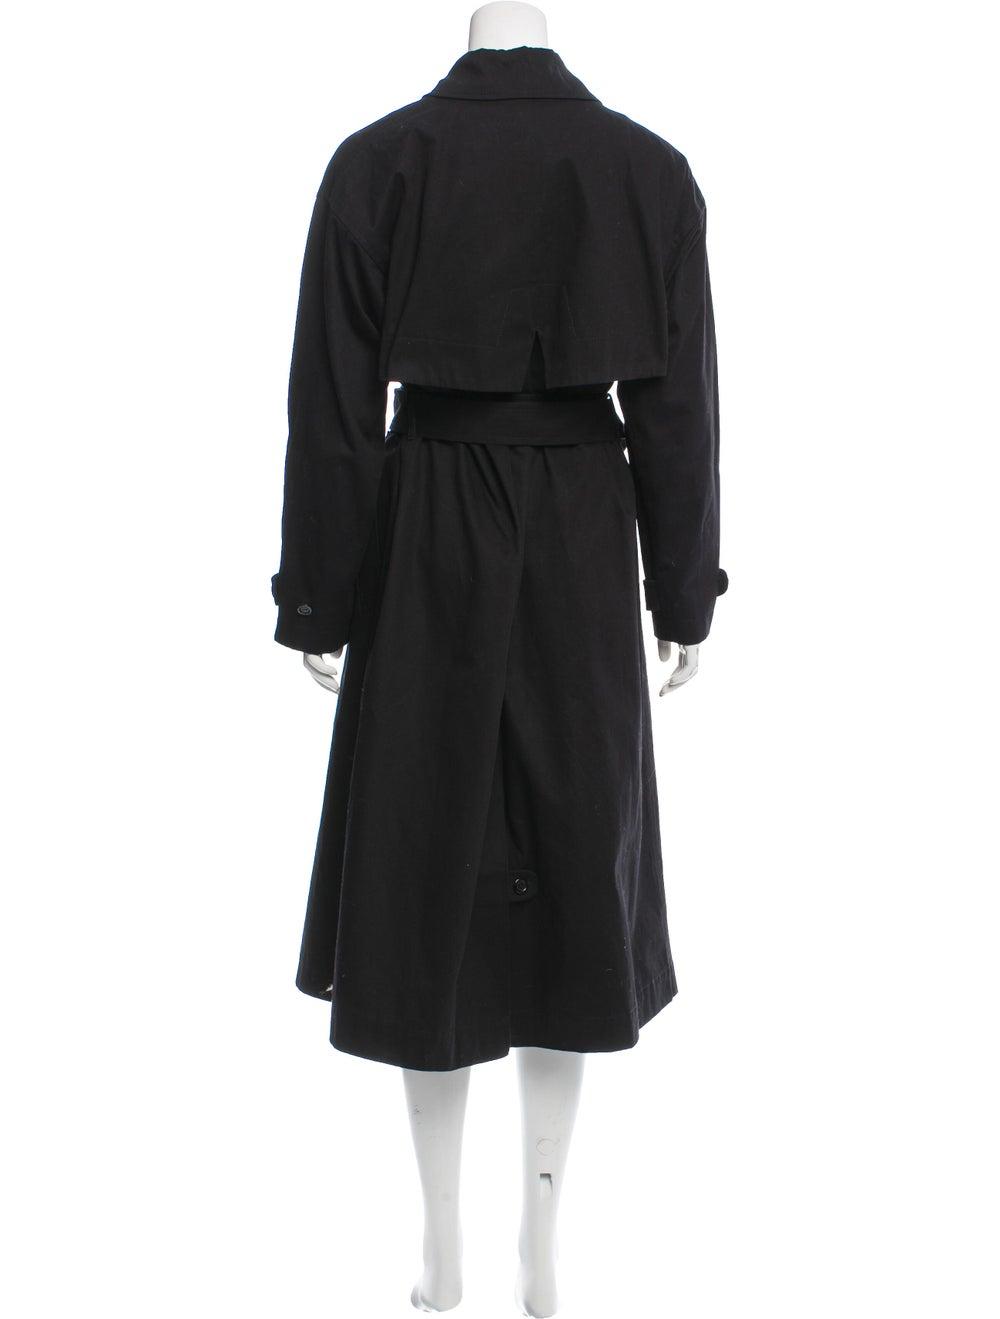 Marimekko Long Button-Up Coat Black - image 3